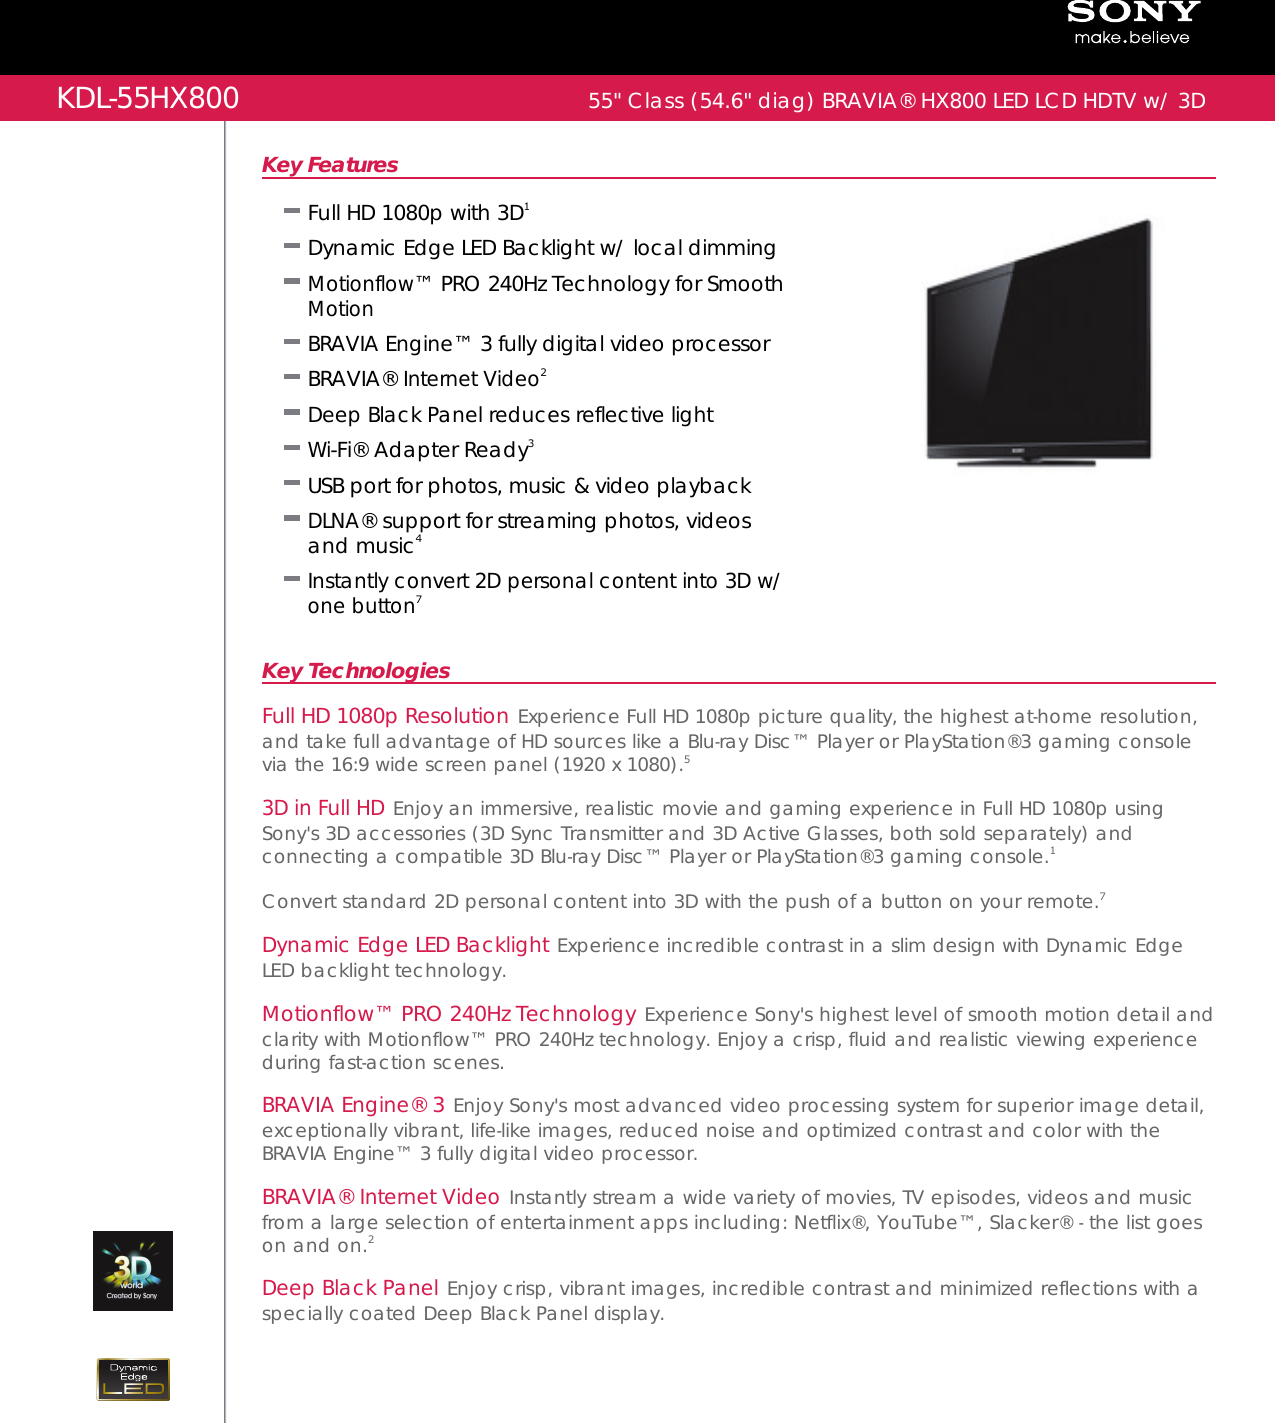 sony kdl 55hx800 user manual marketing specifications kdl series rh usermanual wiki